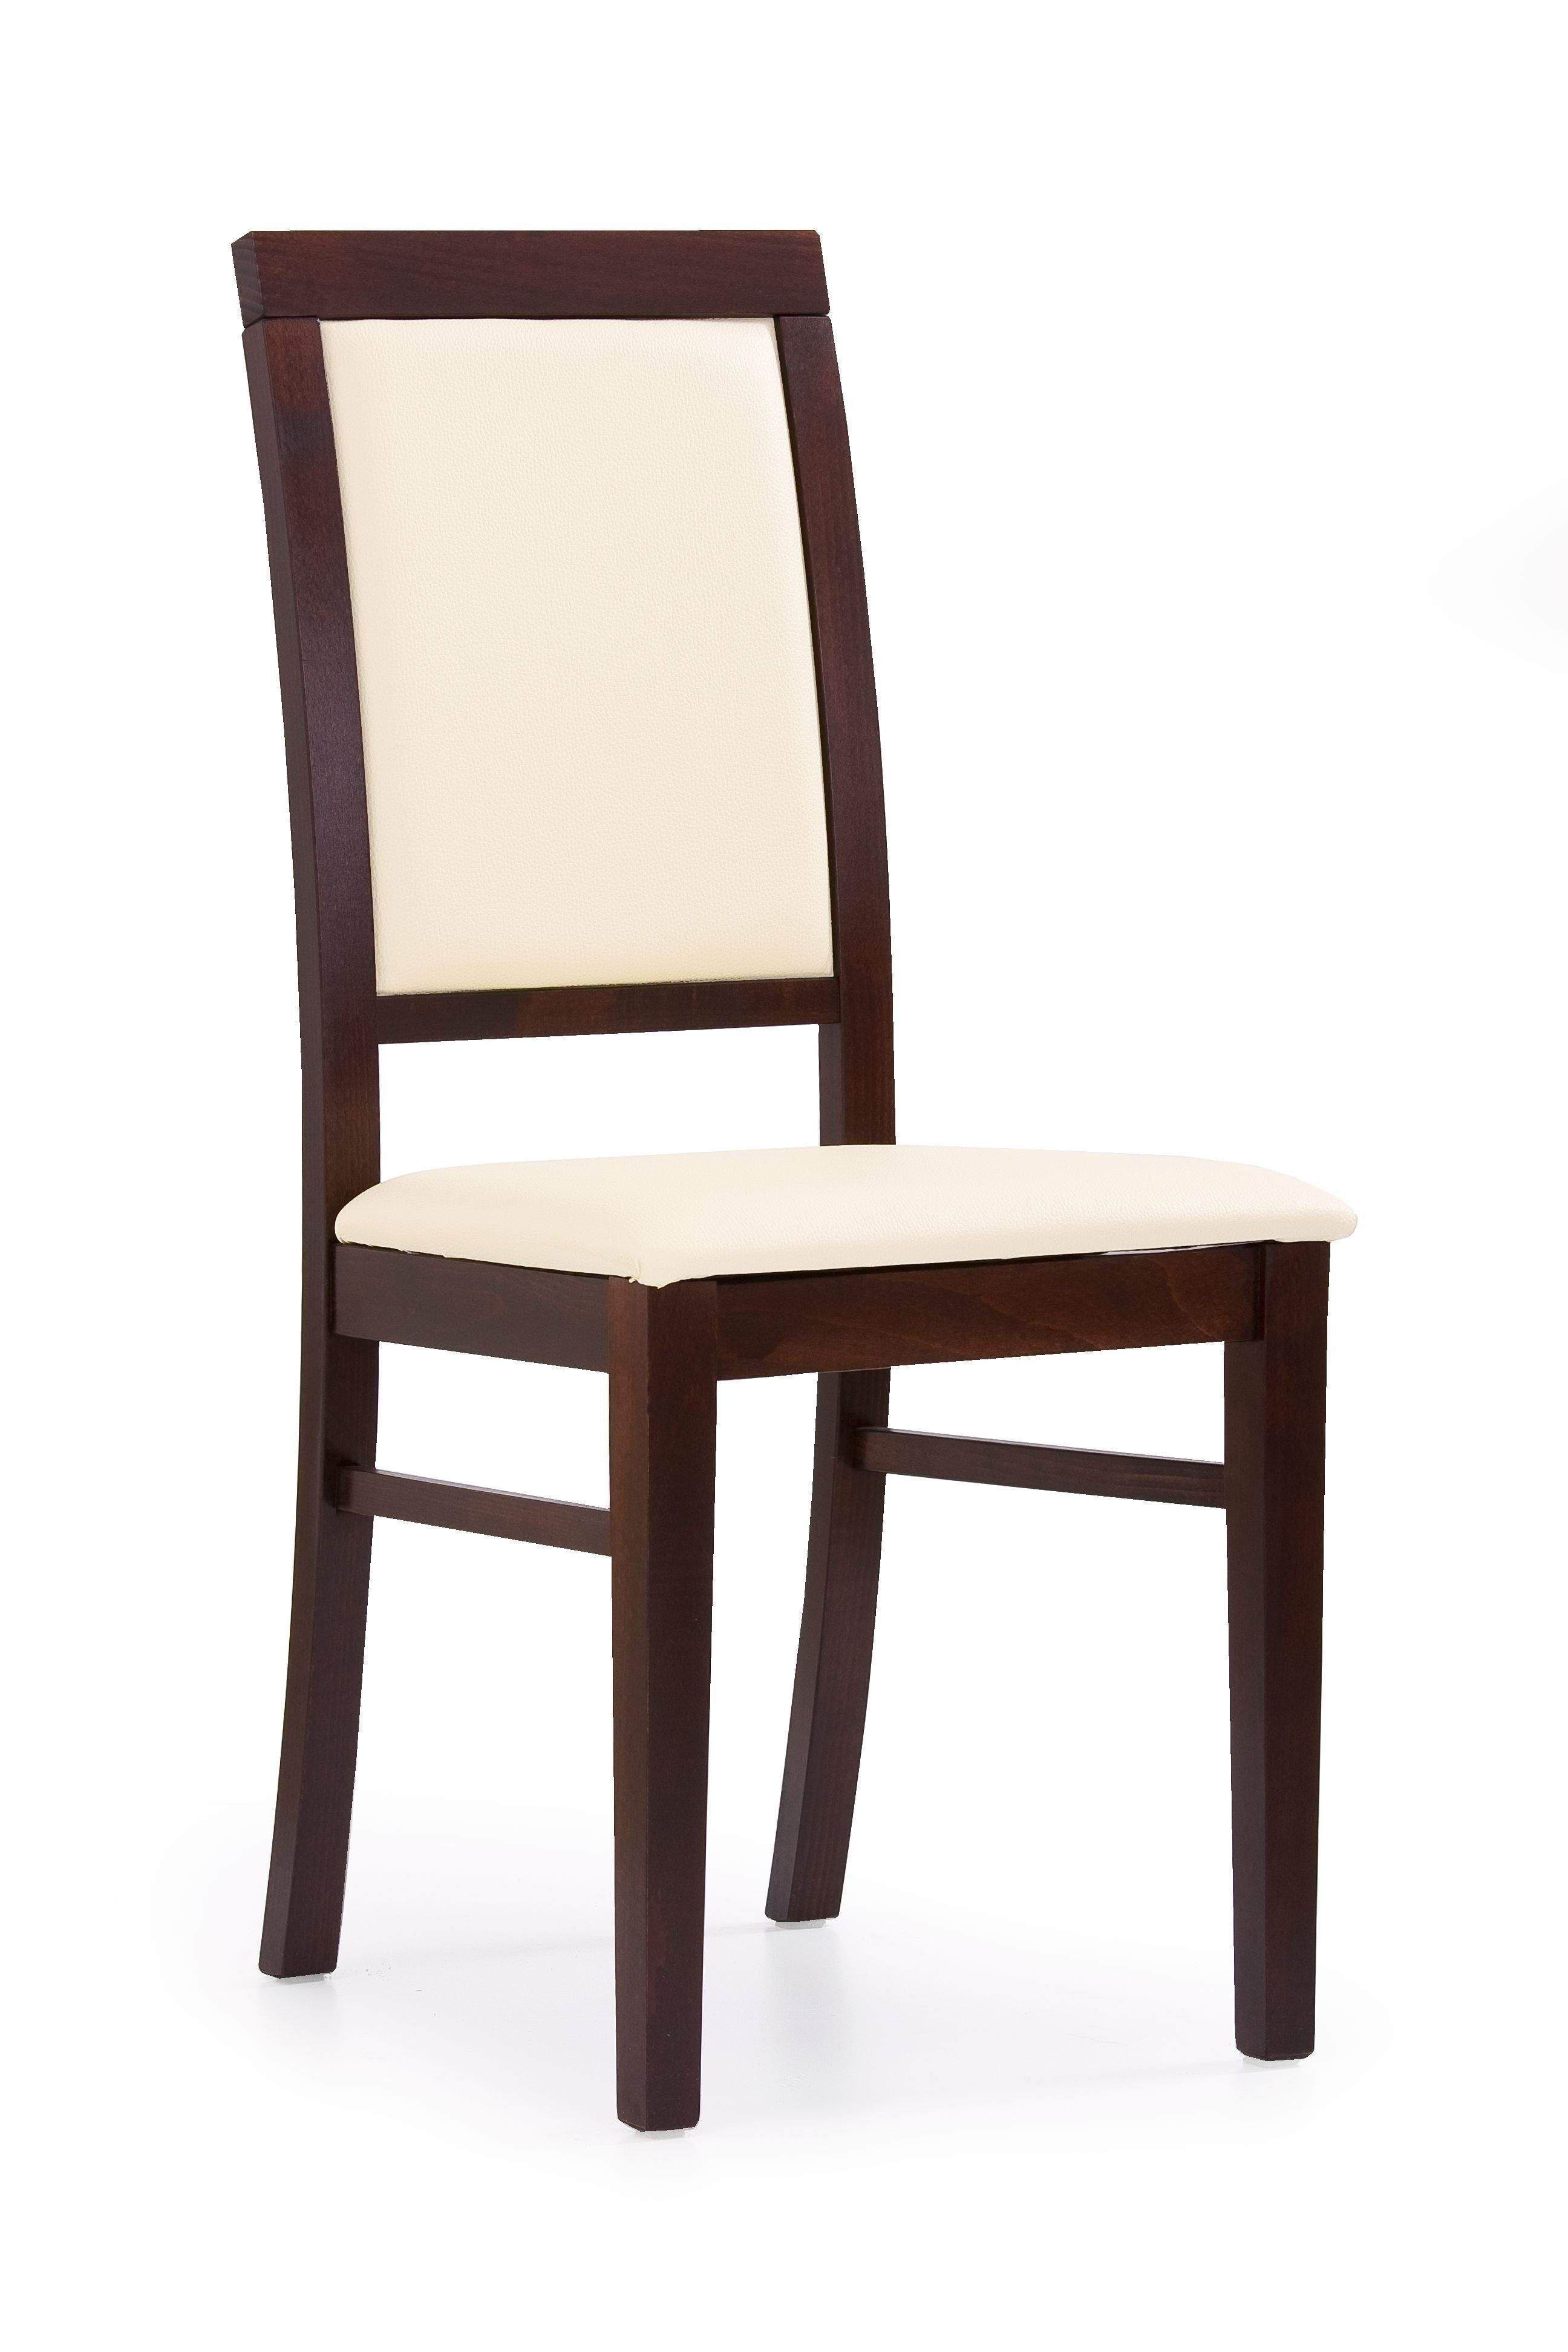 Kėdė SYLWEK 1 riešutas/oda